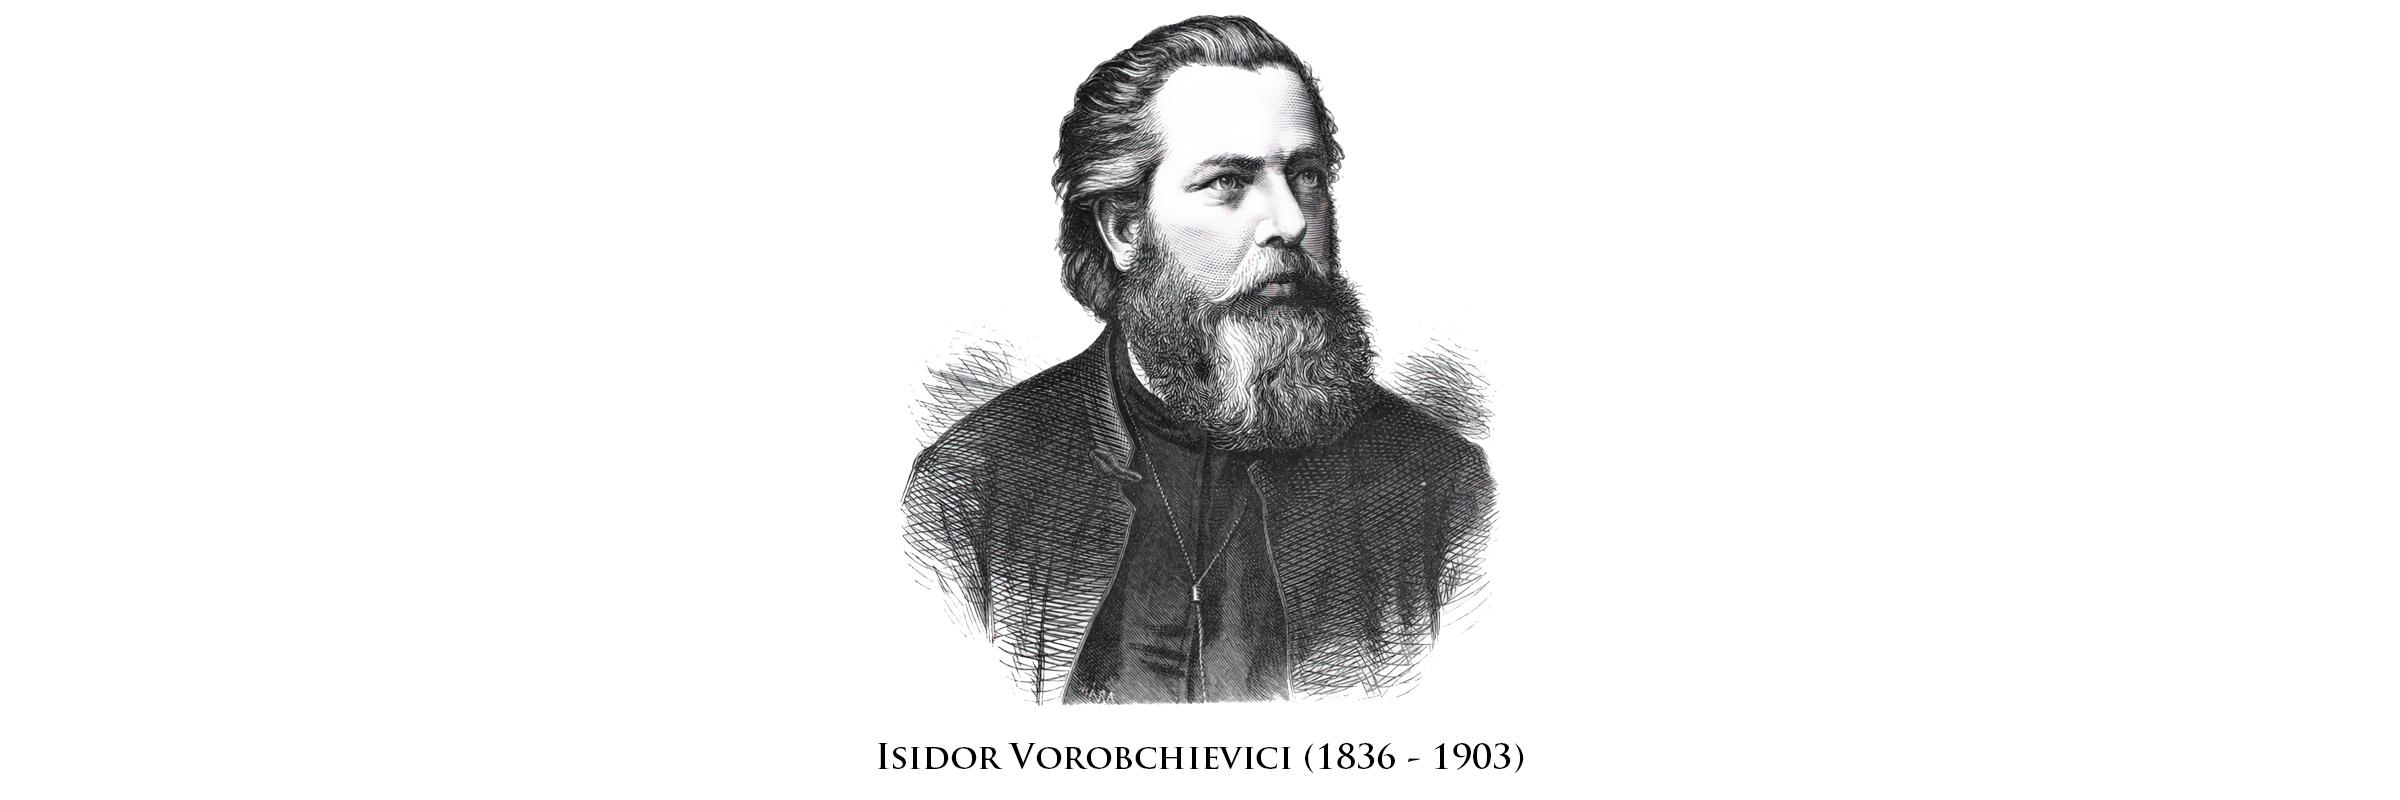 isidor_vorobchievici